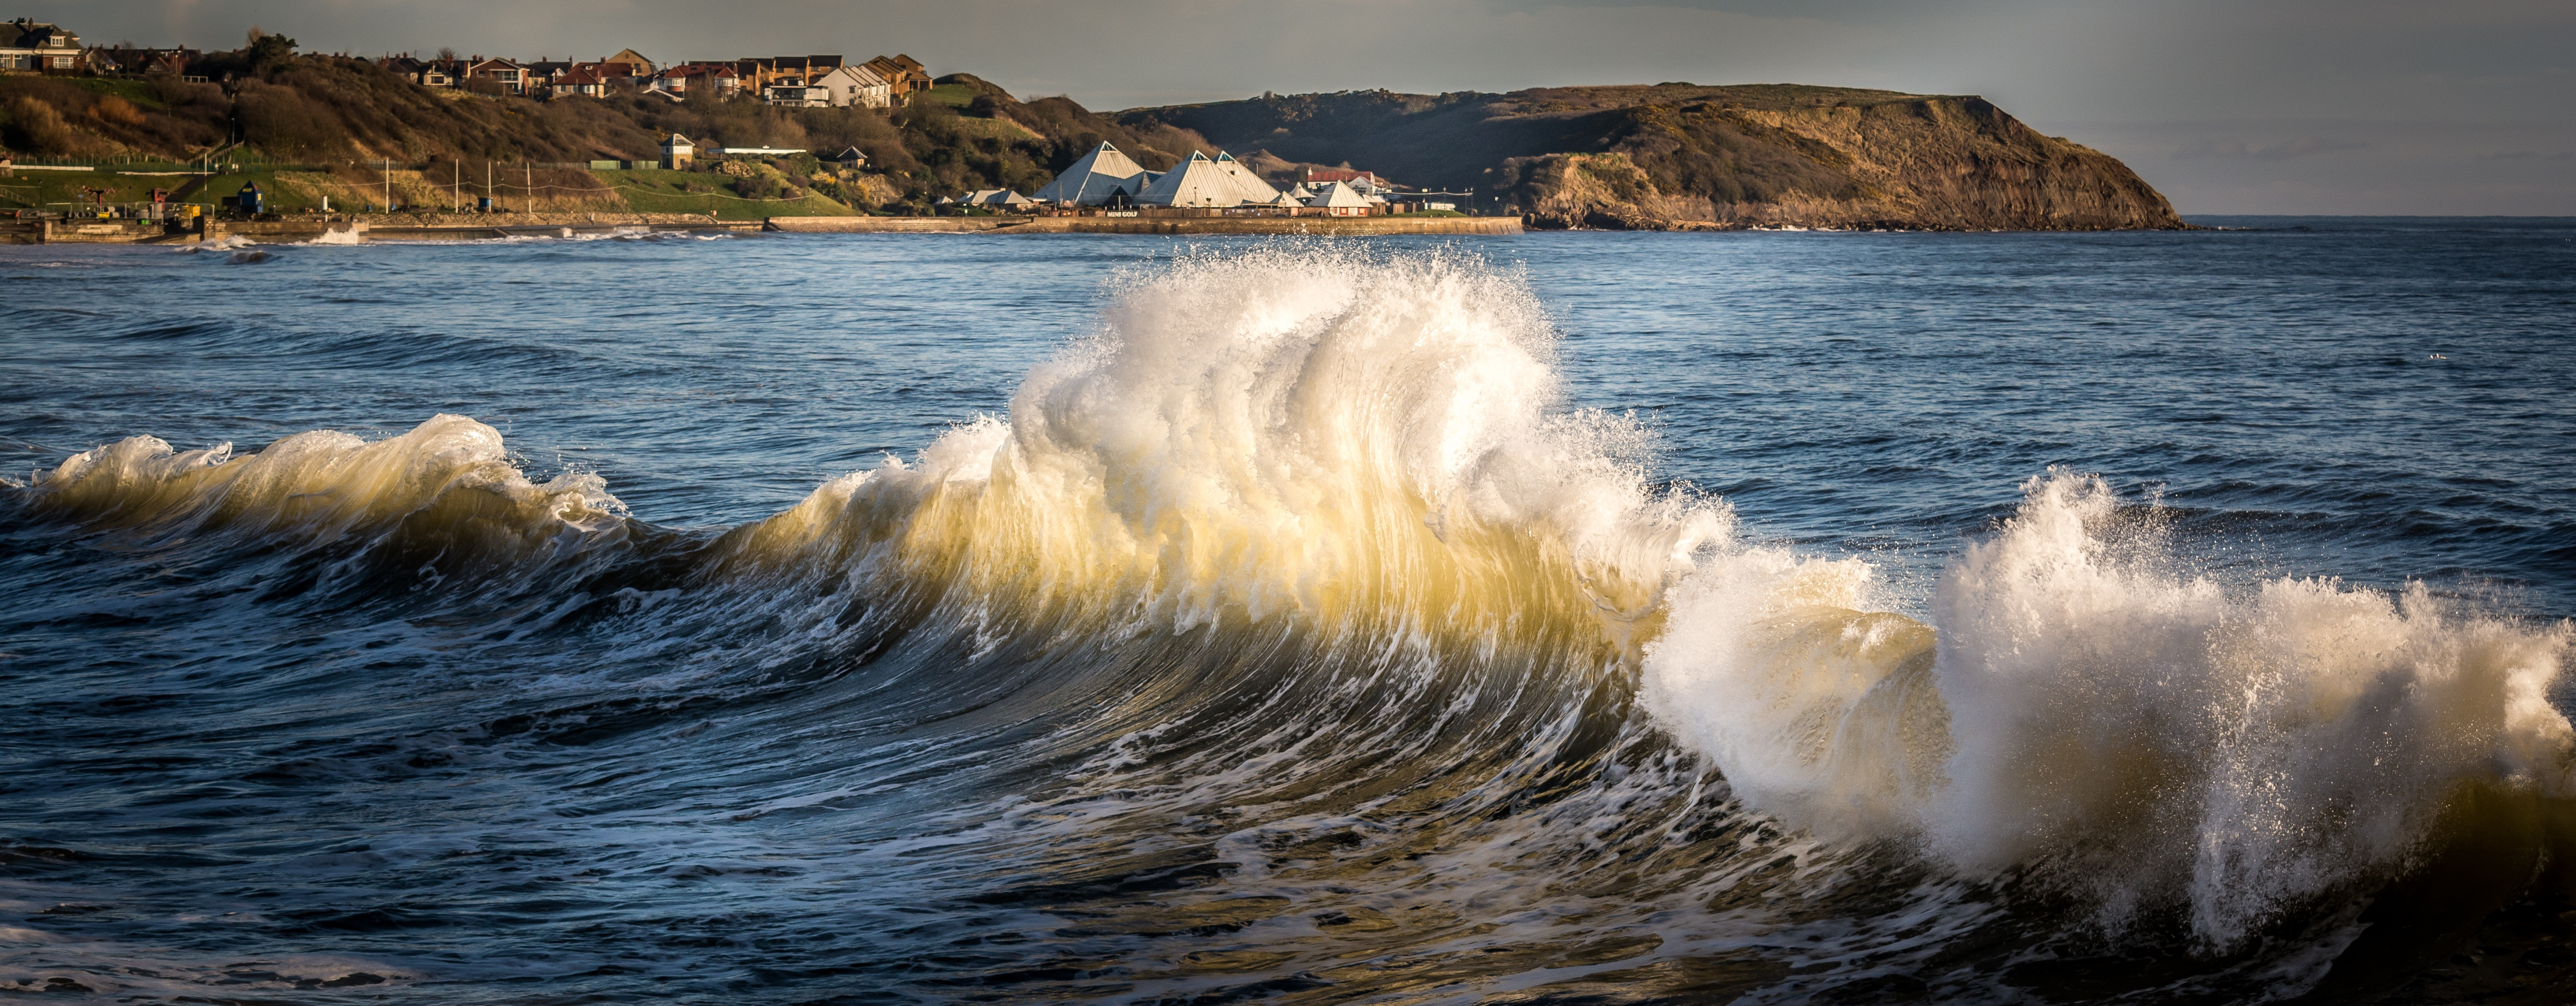 coastal construction wave.jpeg